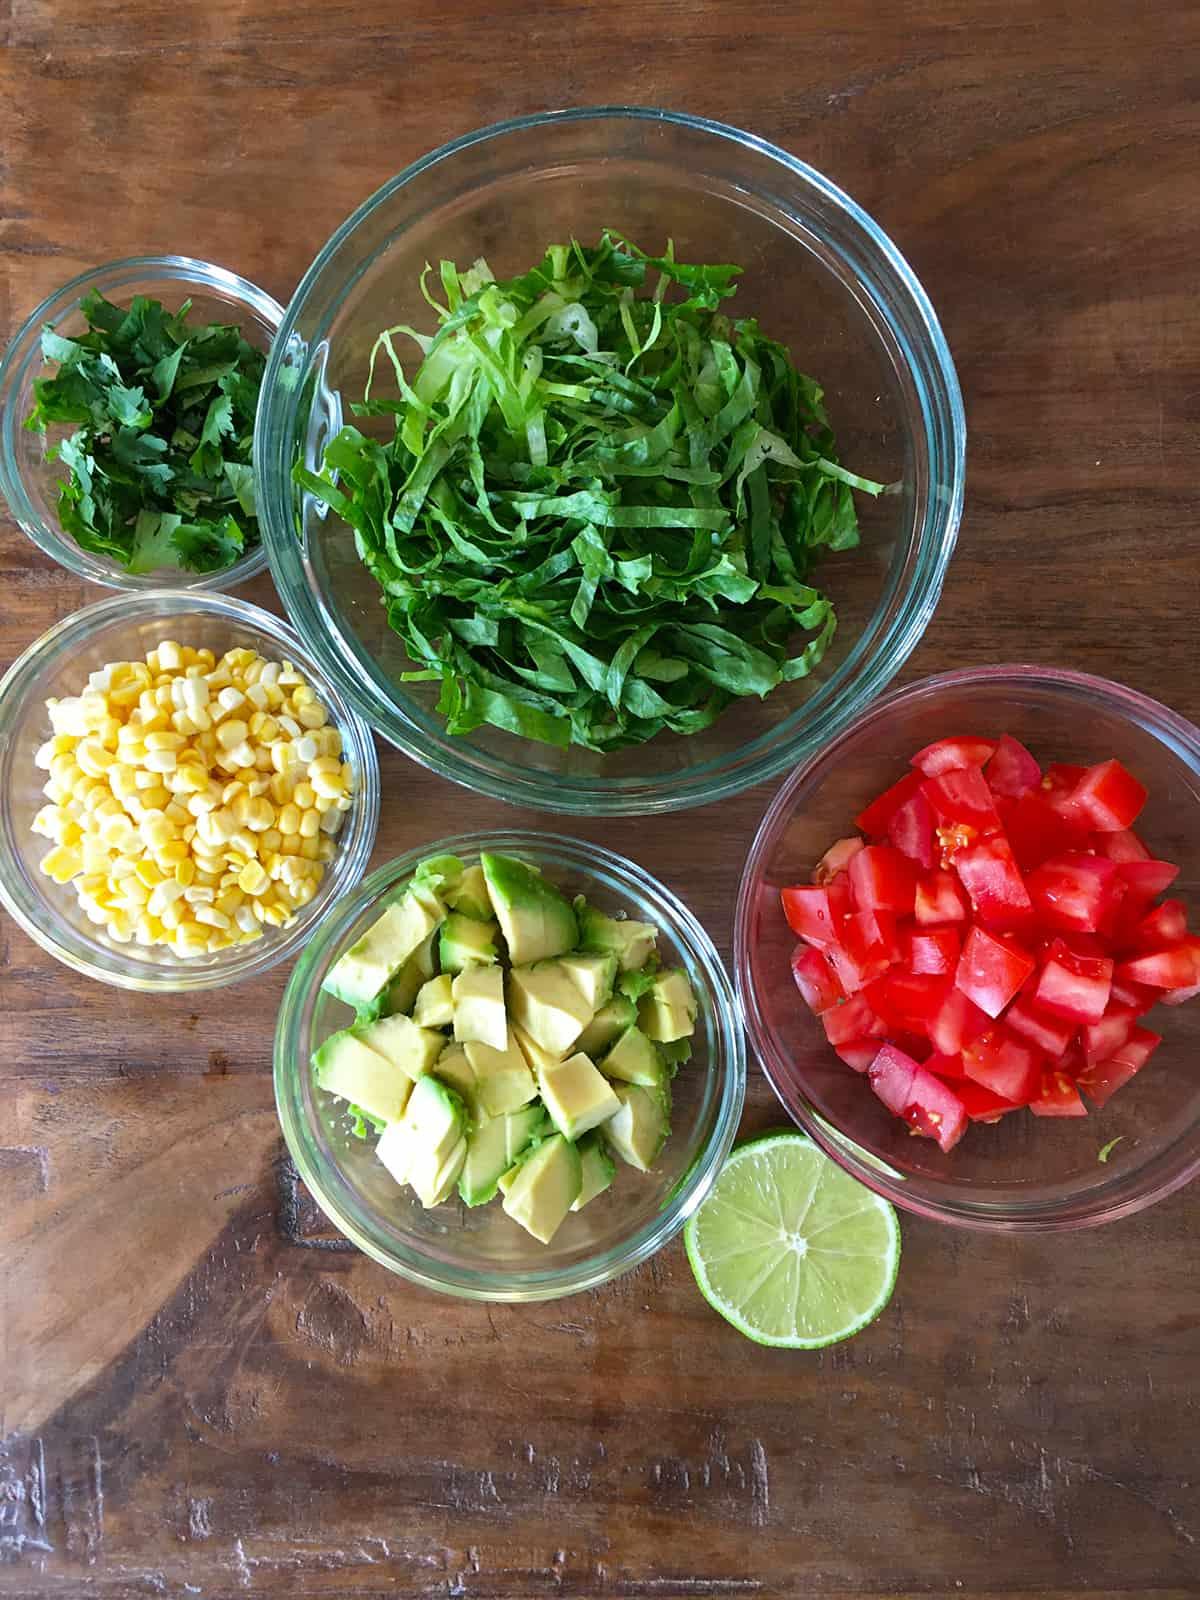 Chopped romaine lettuce, cilantro, corn, avocado and tomato in glass food prep bowls alongside half a lime